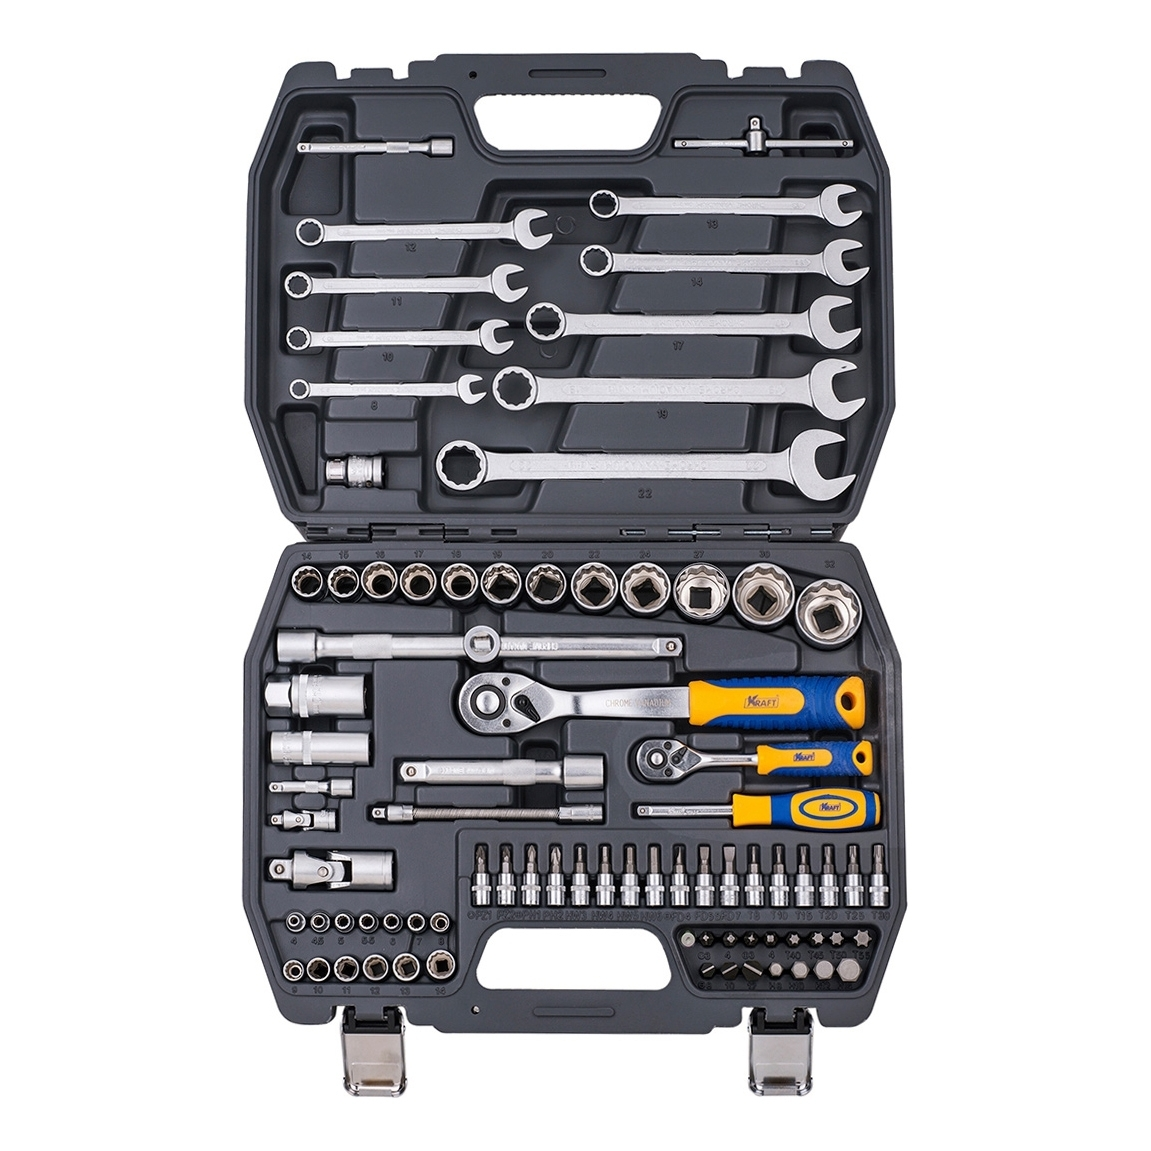 Hand tool set KRAFT CT 700681 82 hideep toliet bidet hand held portable bidet sprayer shattaf toilet shower spray set tap